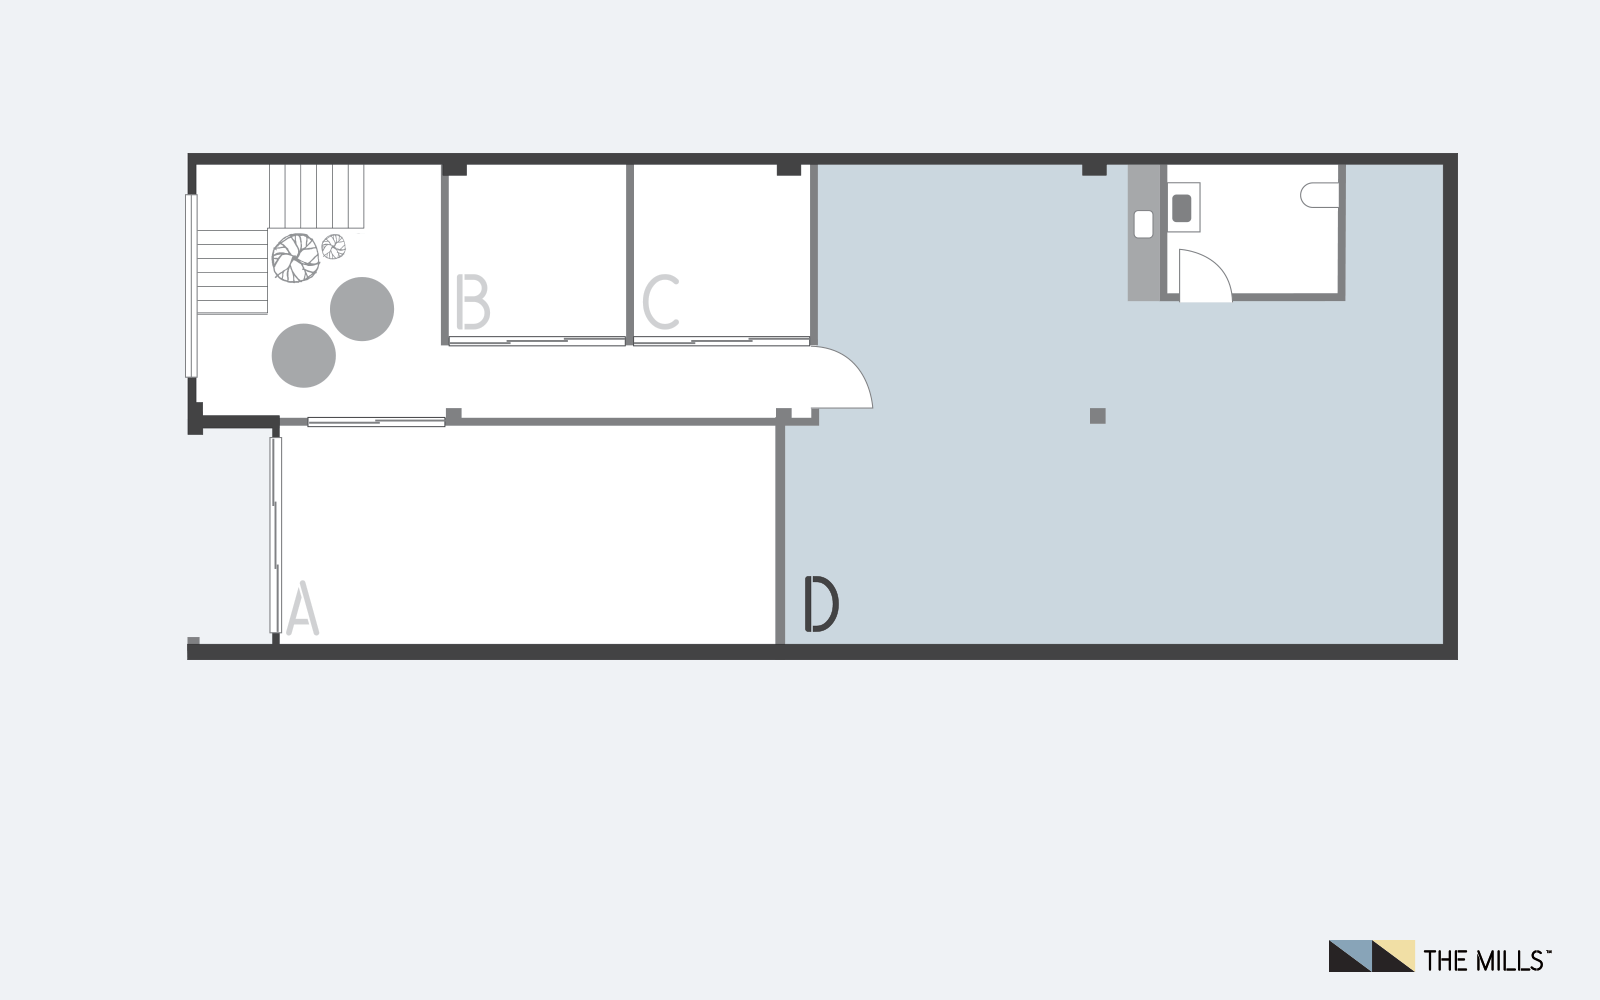 the_mills__creative_spaces_studio_D